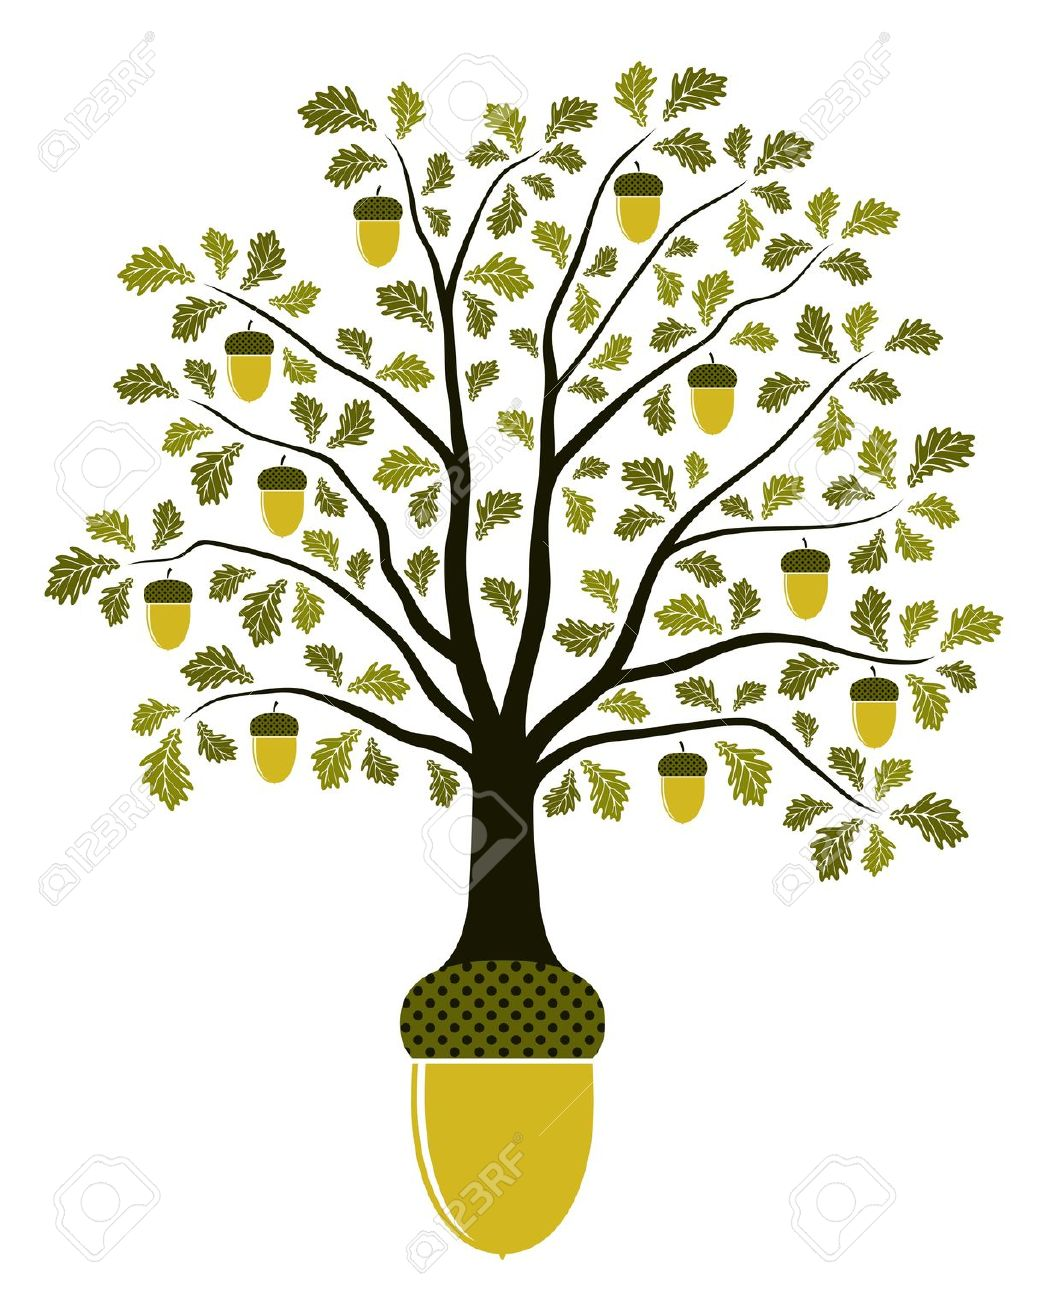 White oak tree black and white clipart with acorns.